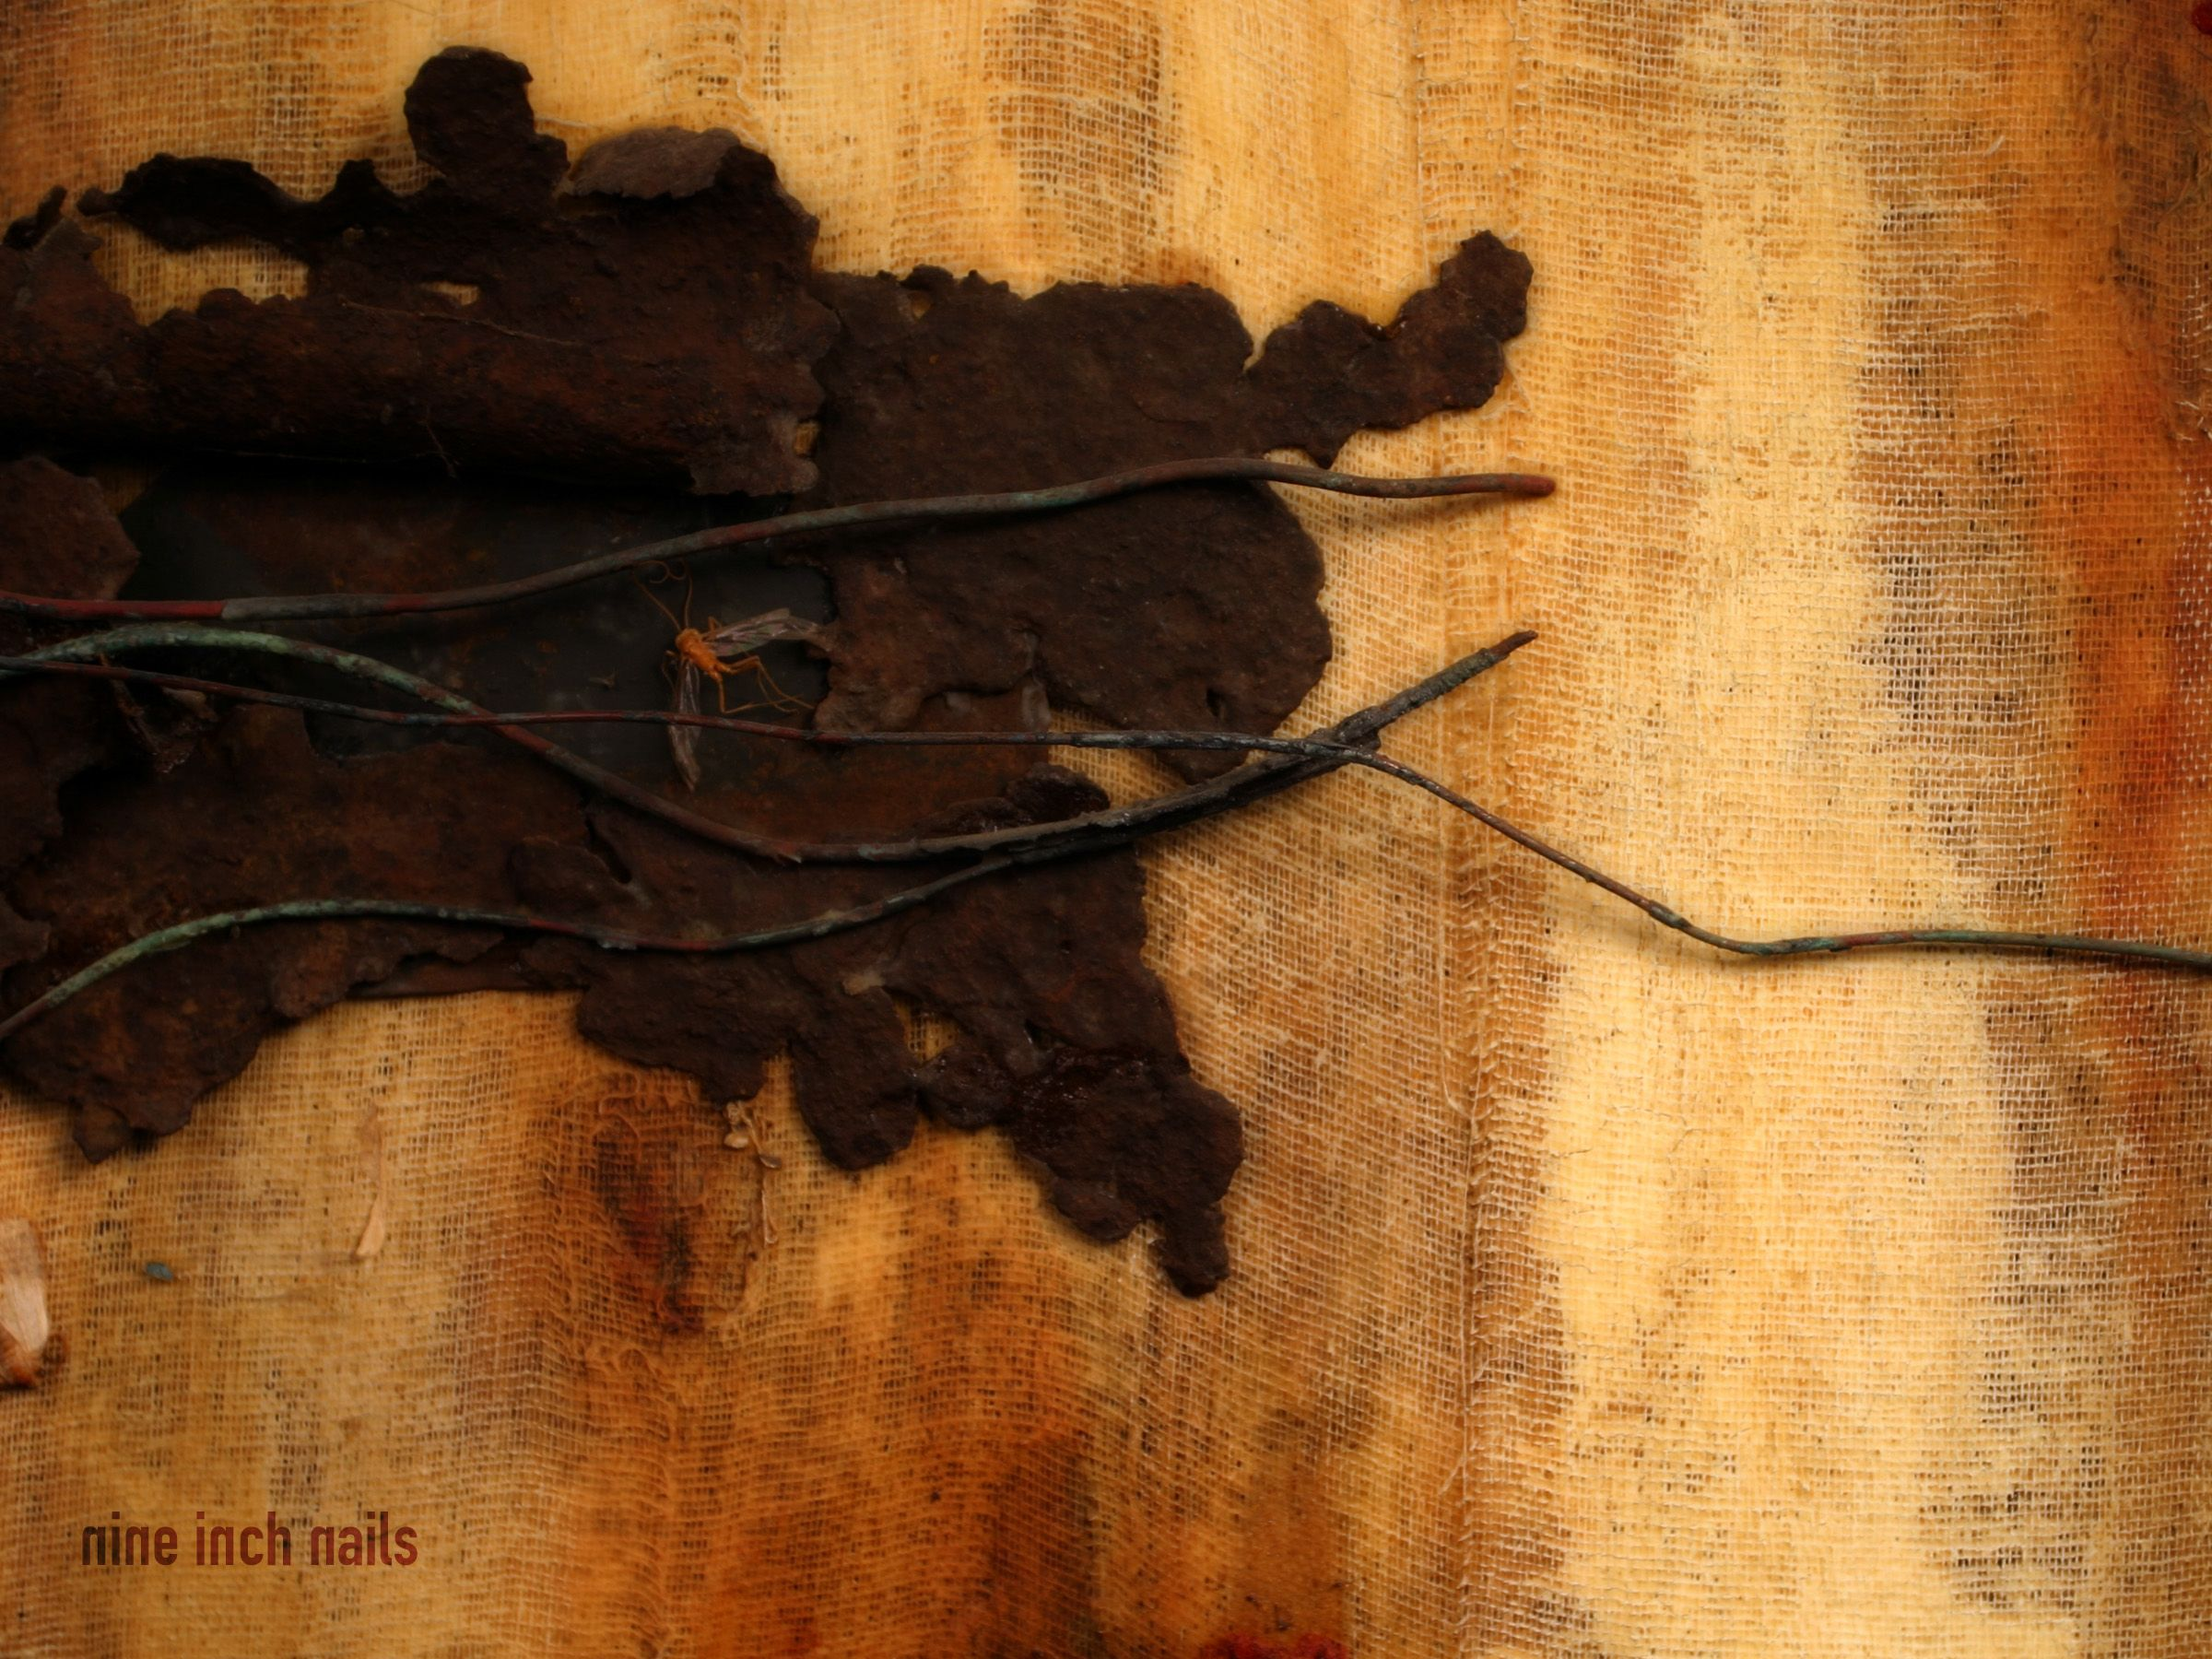 Downward Spiral, Nine Inch Nails   Album Covers   Pinterest